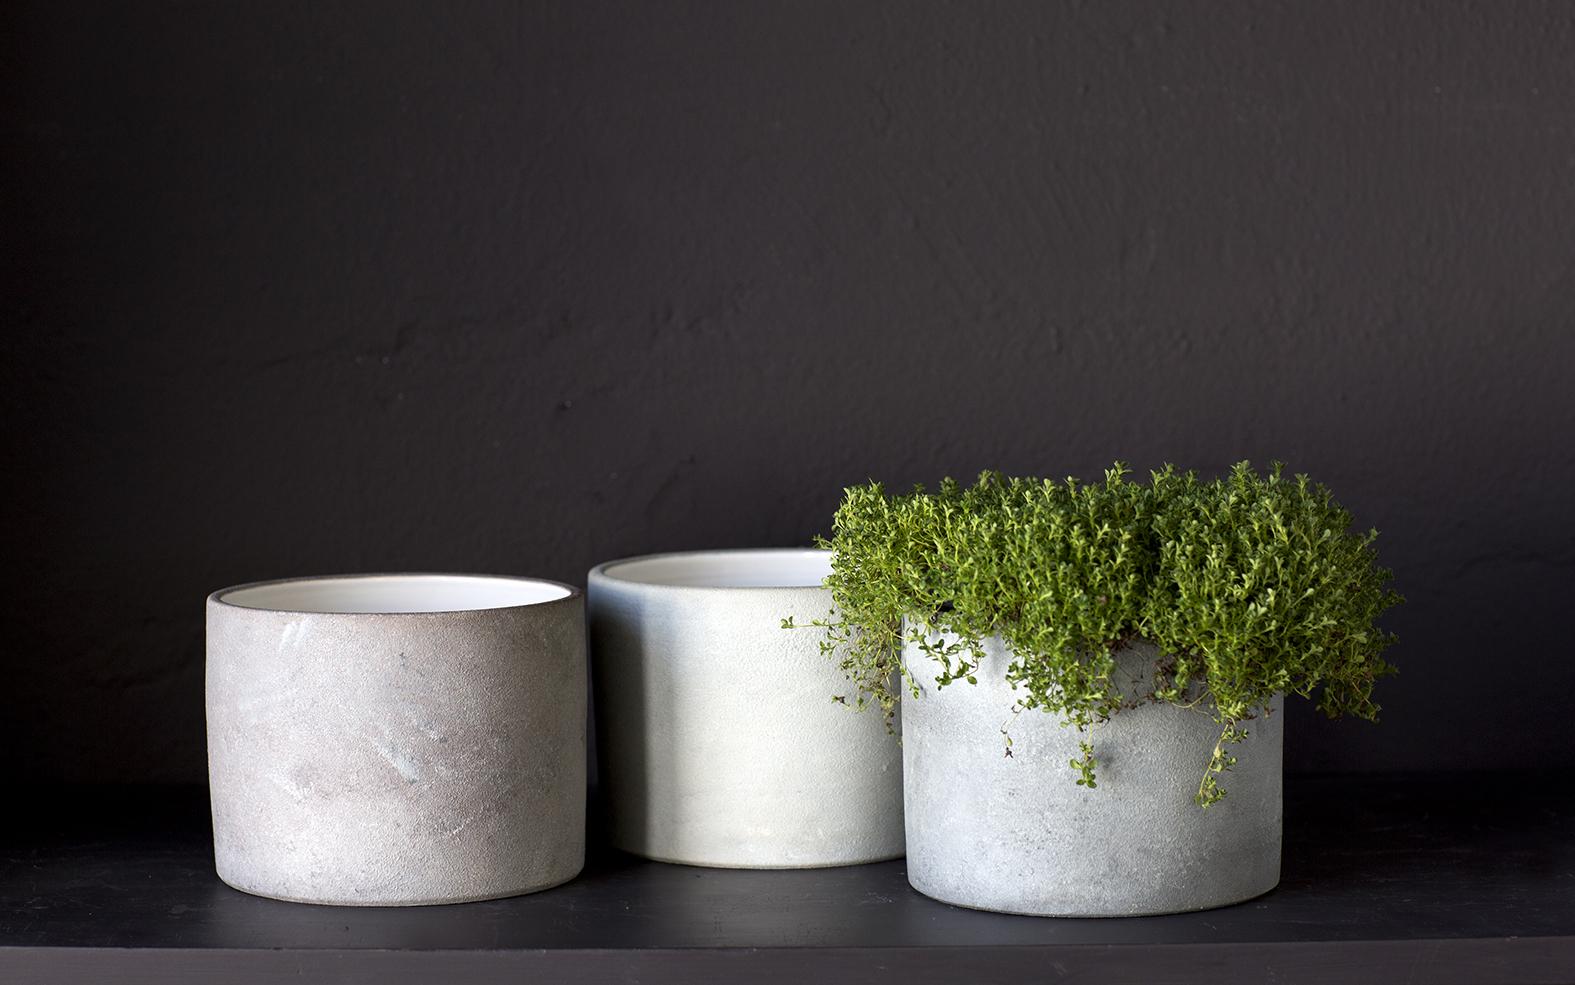 Herb potts